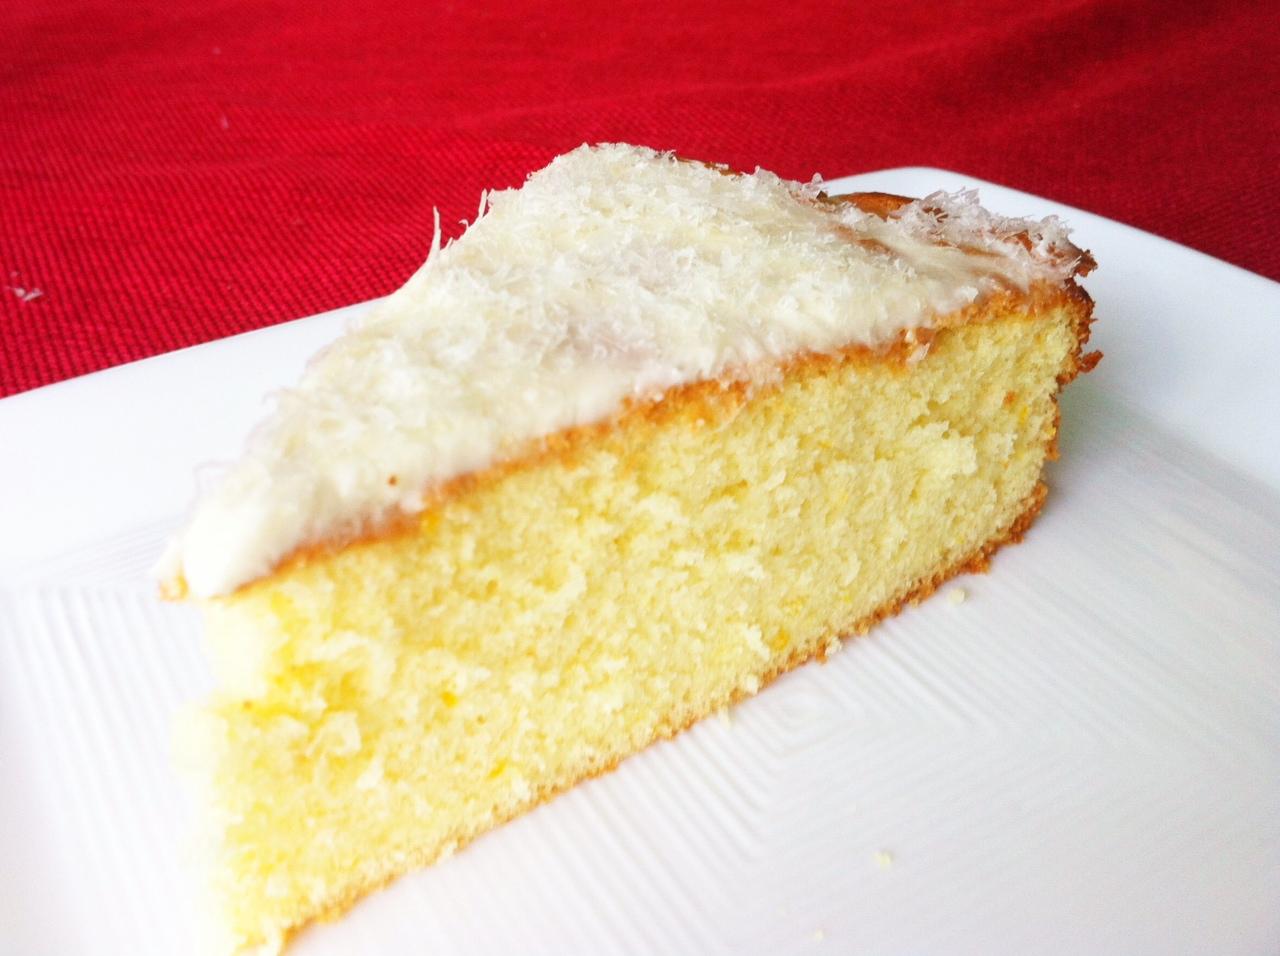 Inch Foil Tins For Baking A Sponge Cake